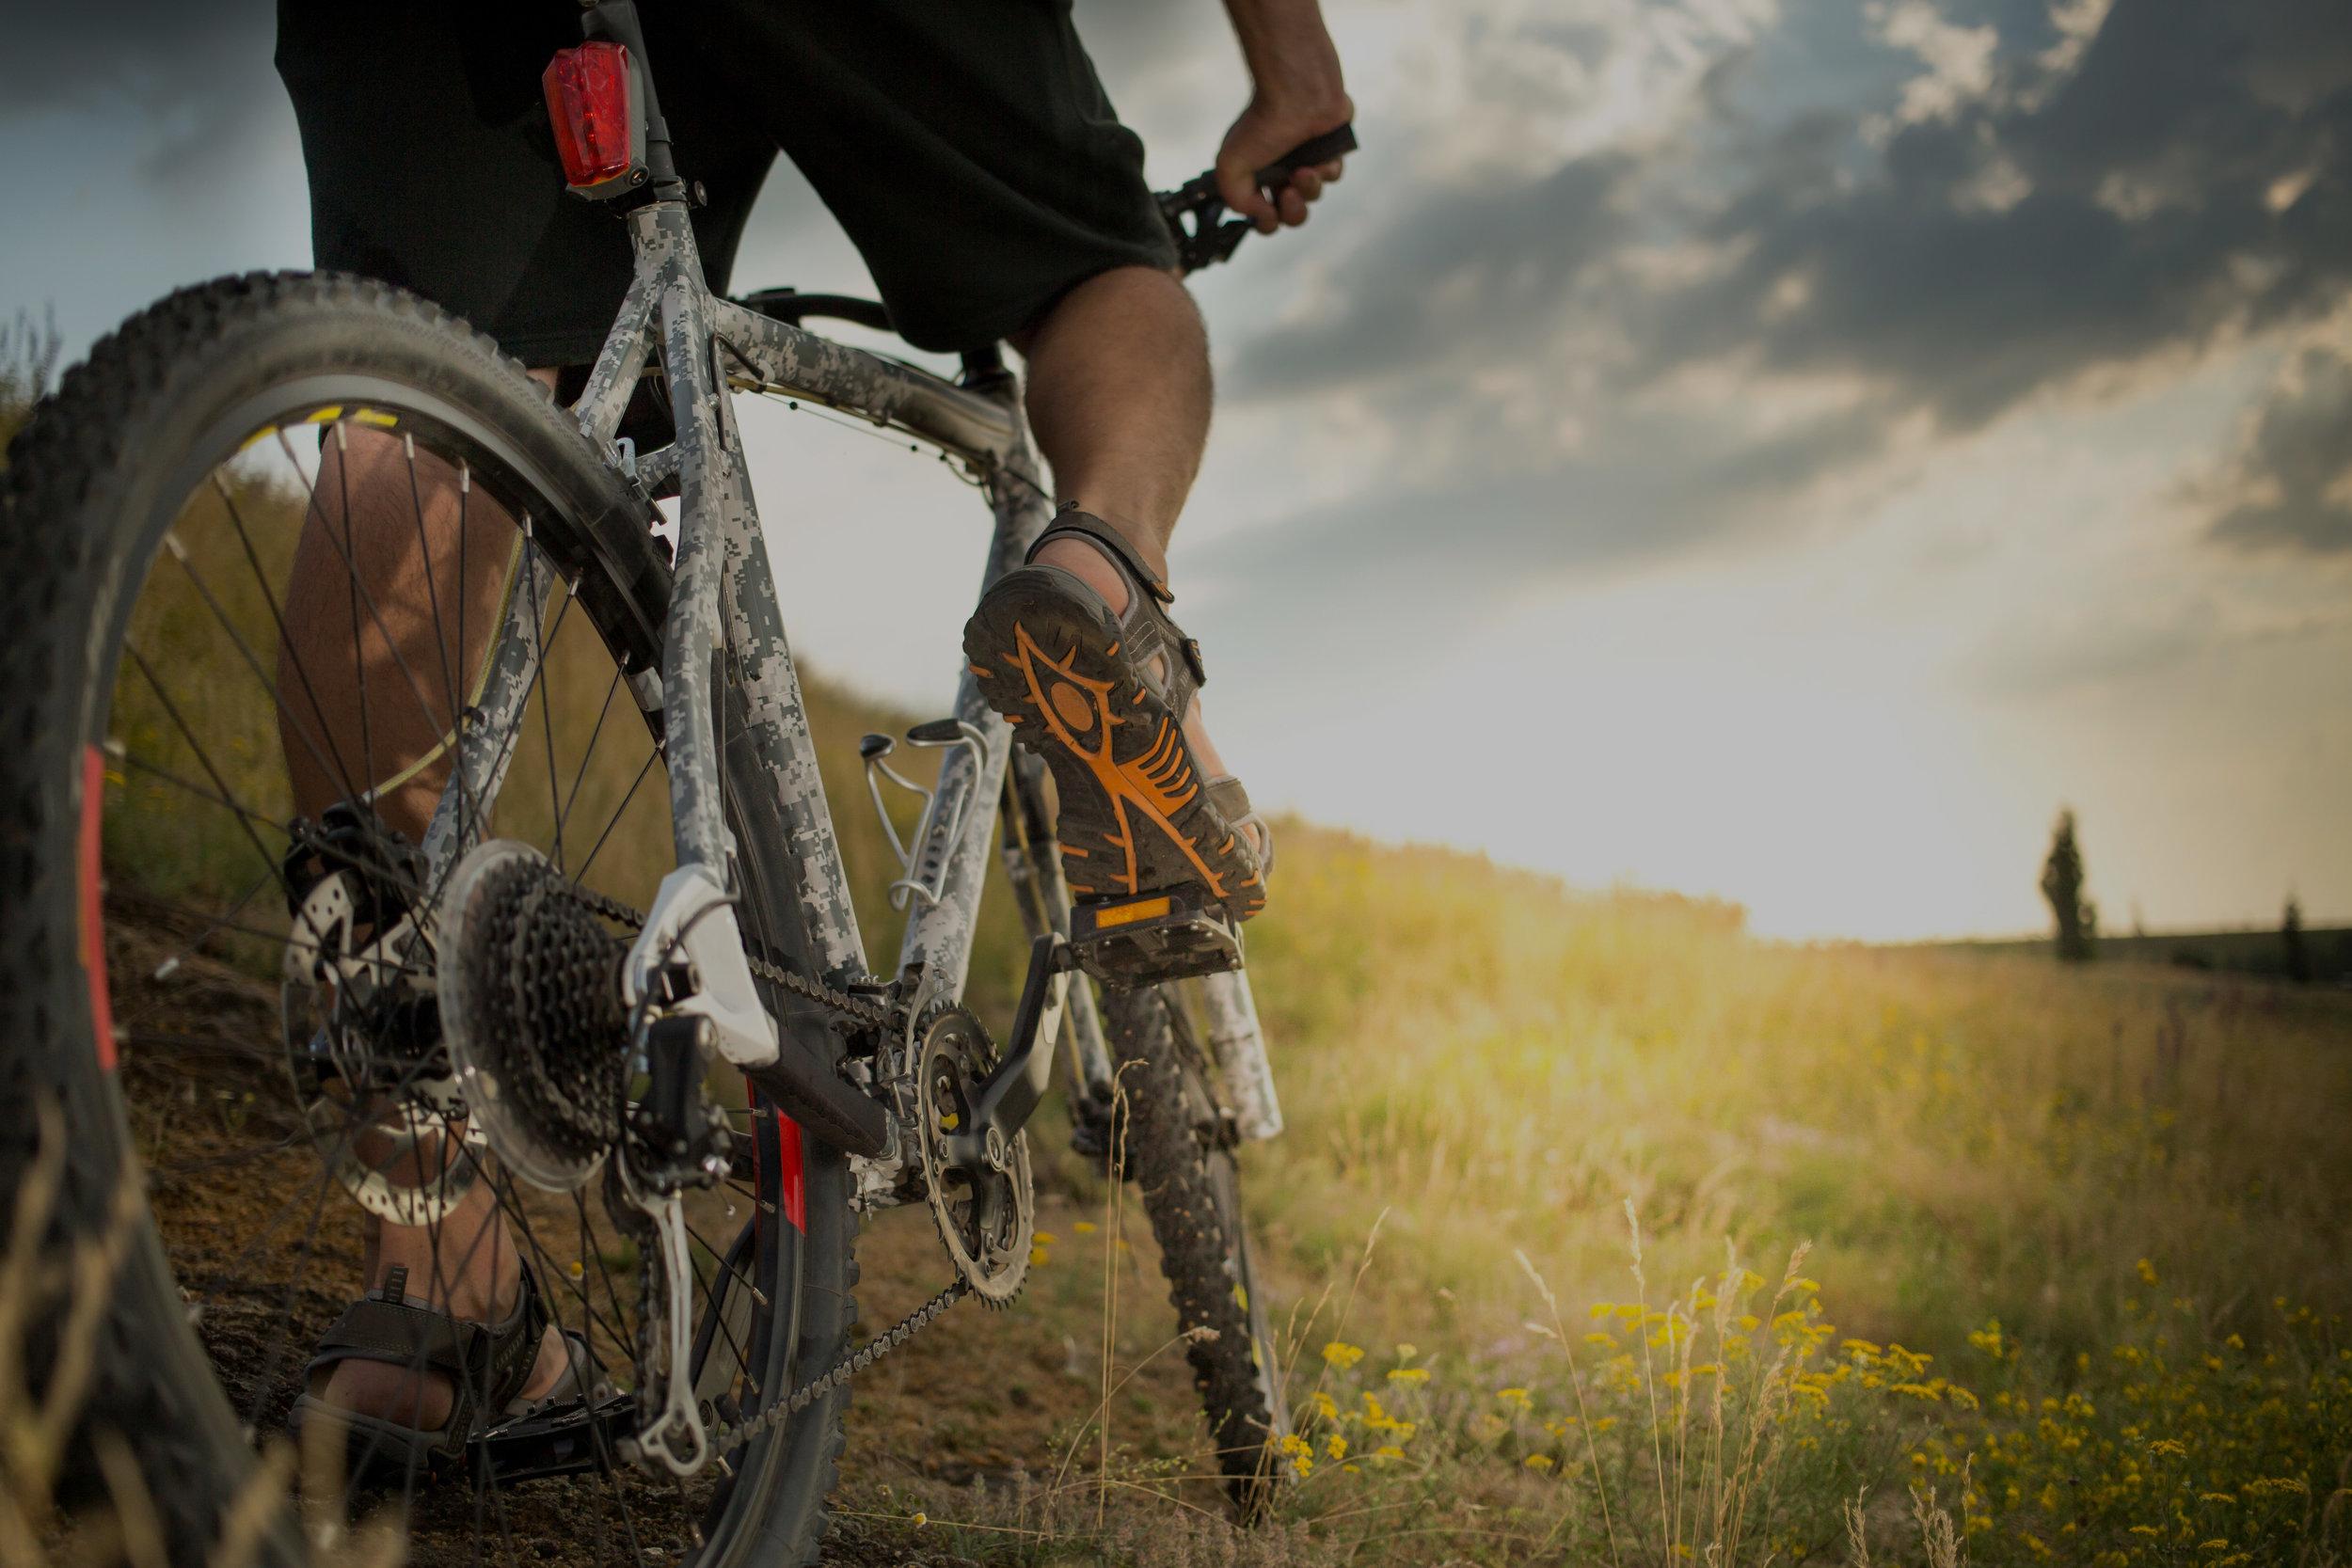 Das ultimative Bike-Arrangement